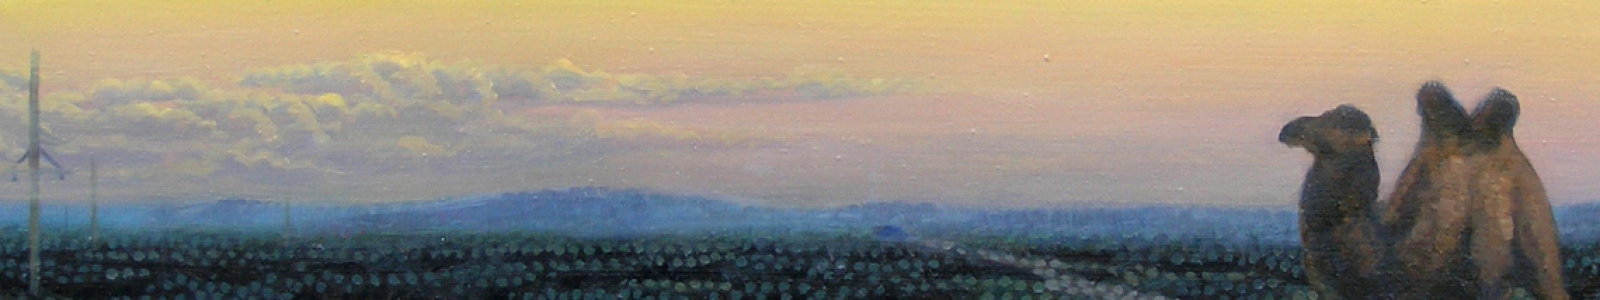 Gallery Painter Kaliolla Akhmetzhan